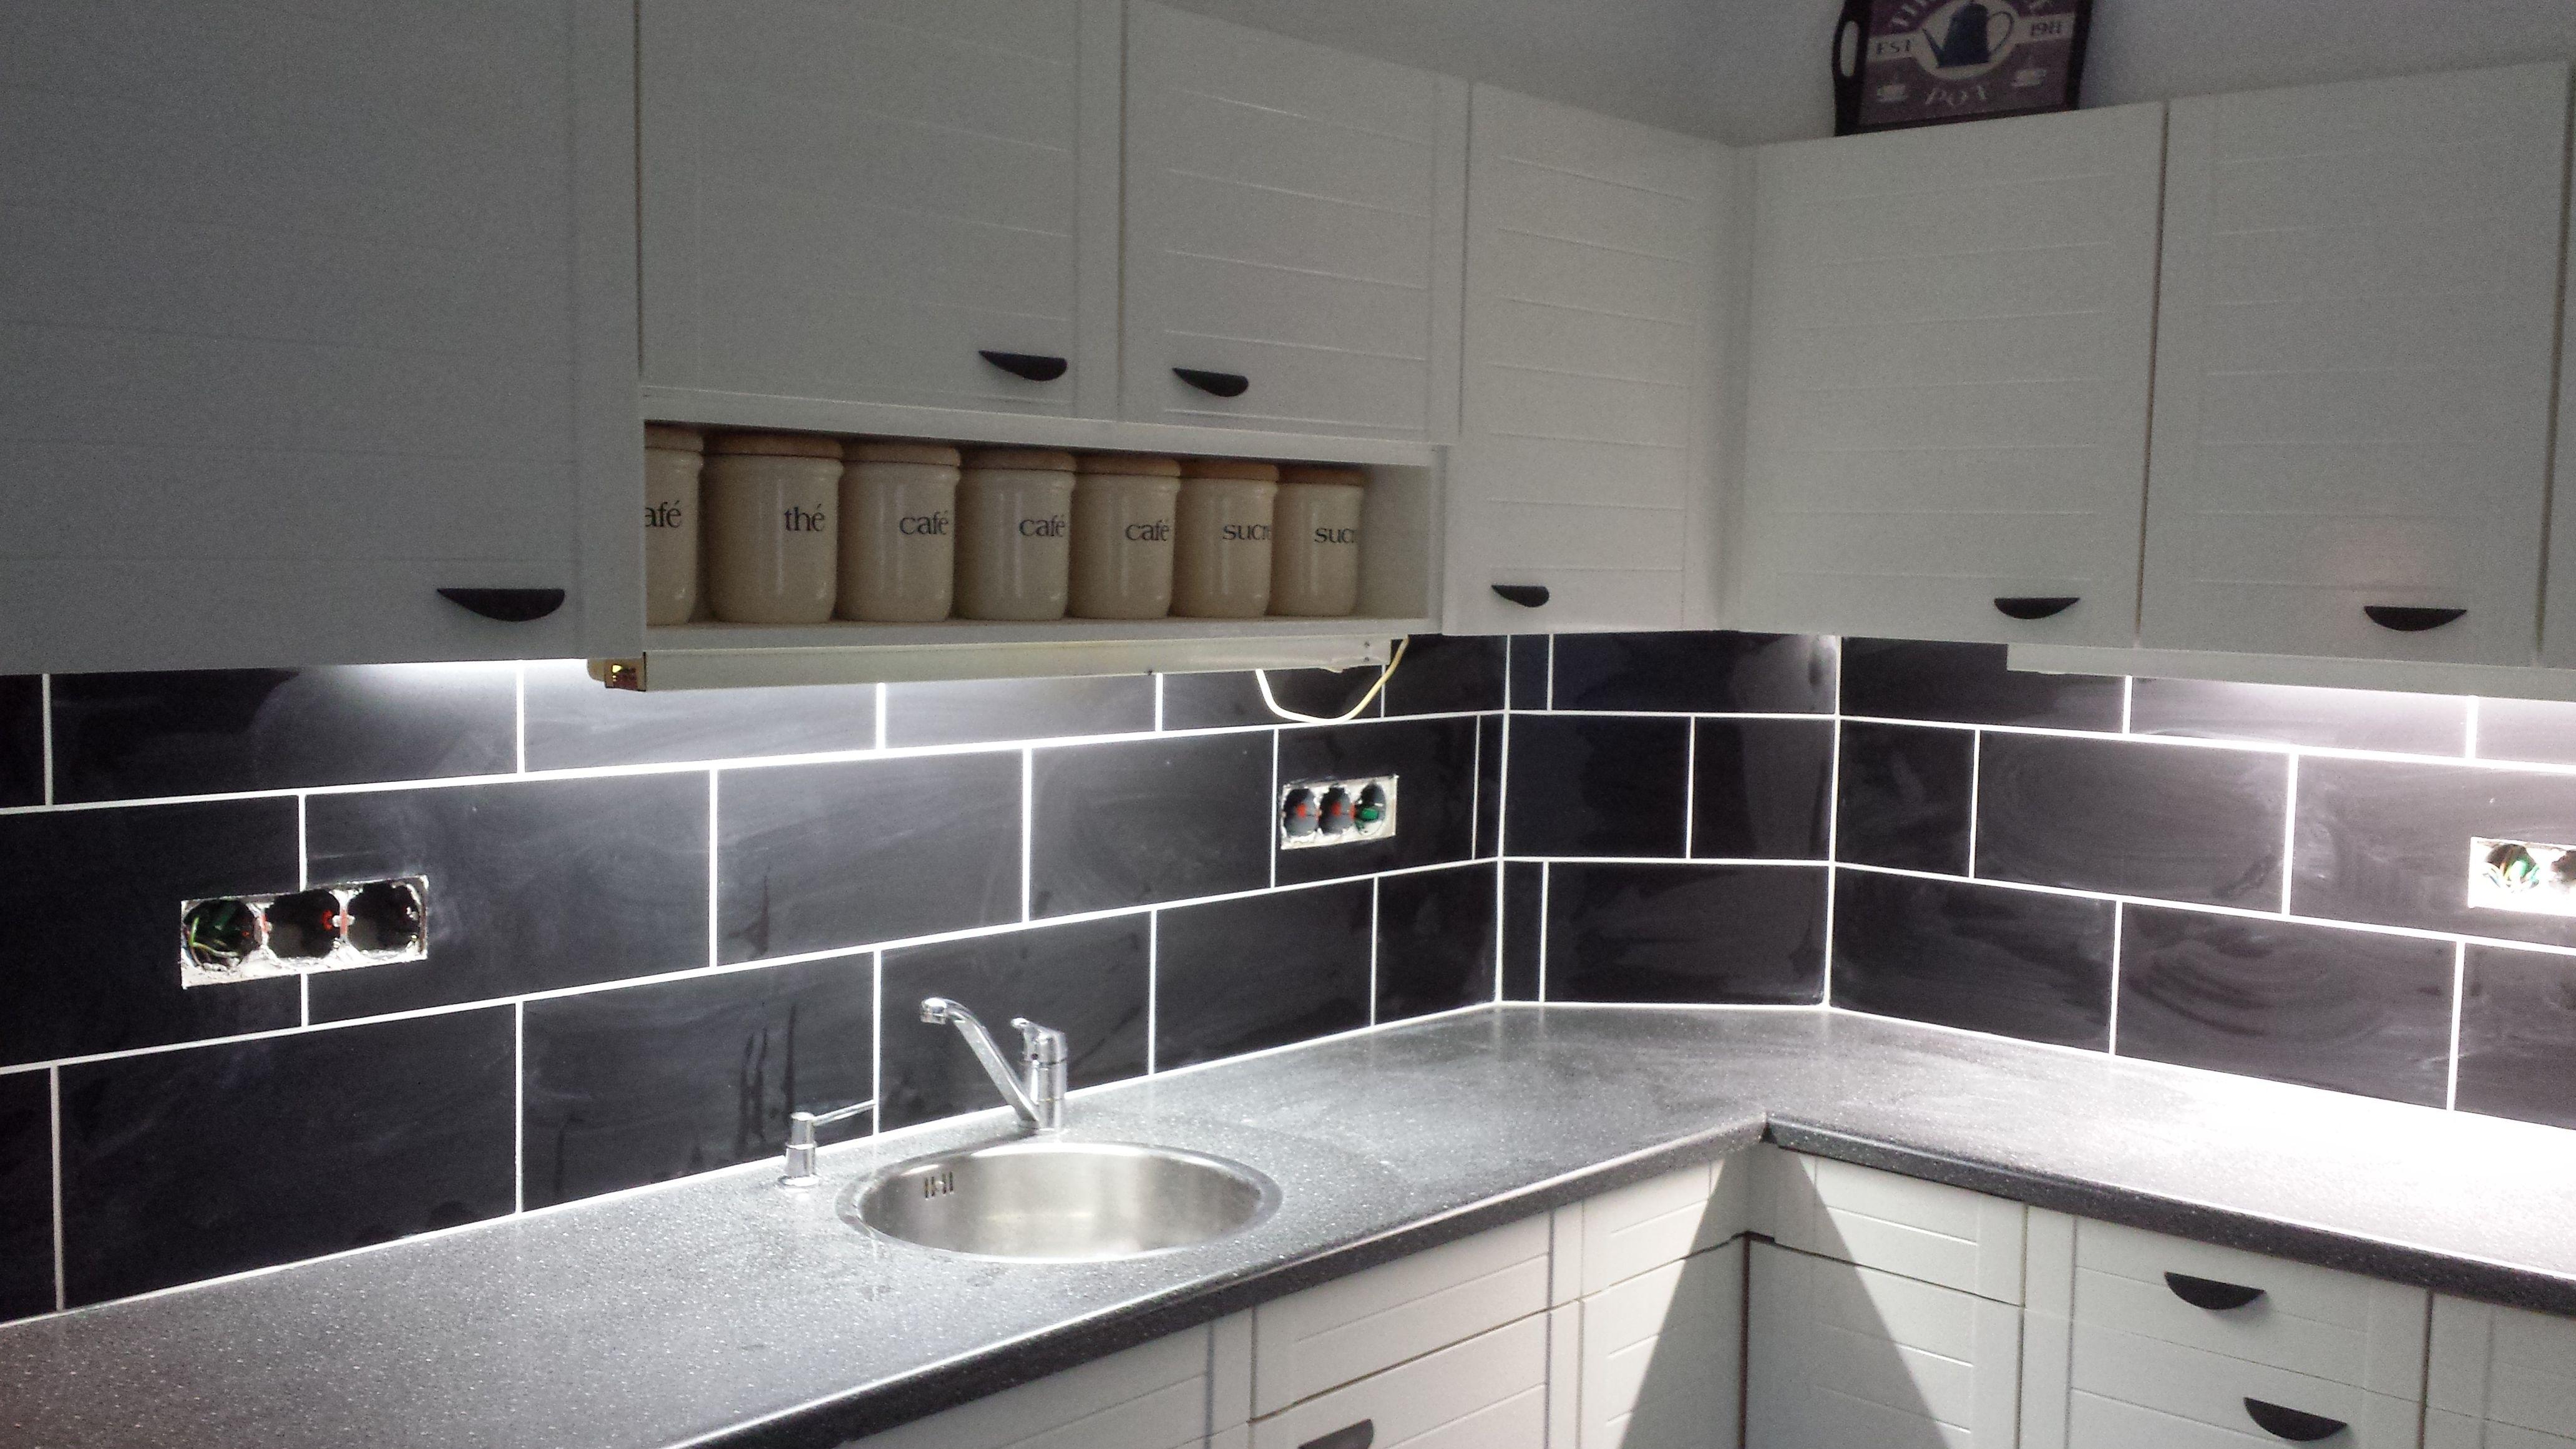 Design Wandtegels Keuken : Ontzette wandtegels keuken cmk joinery